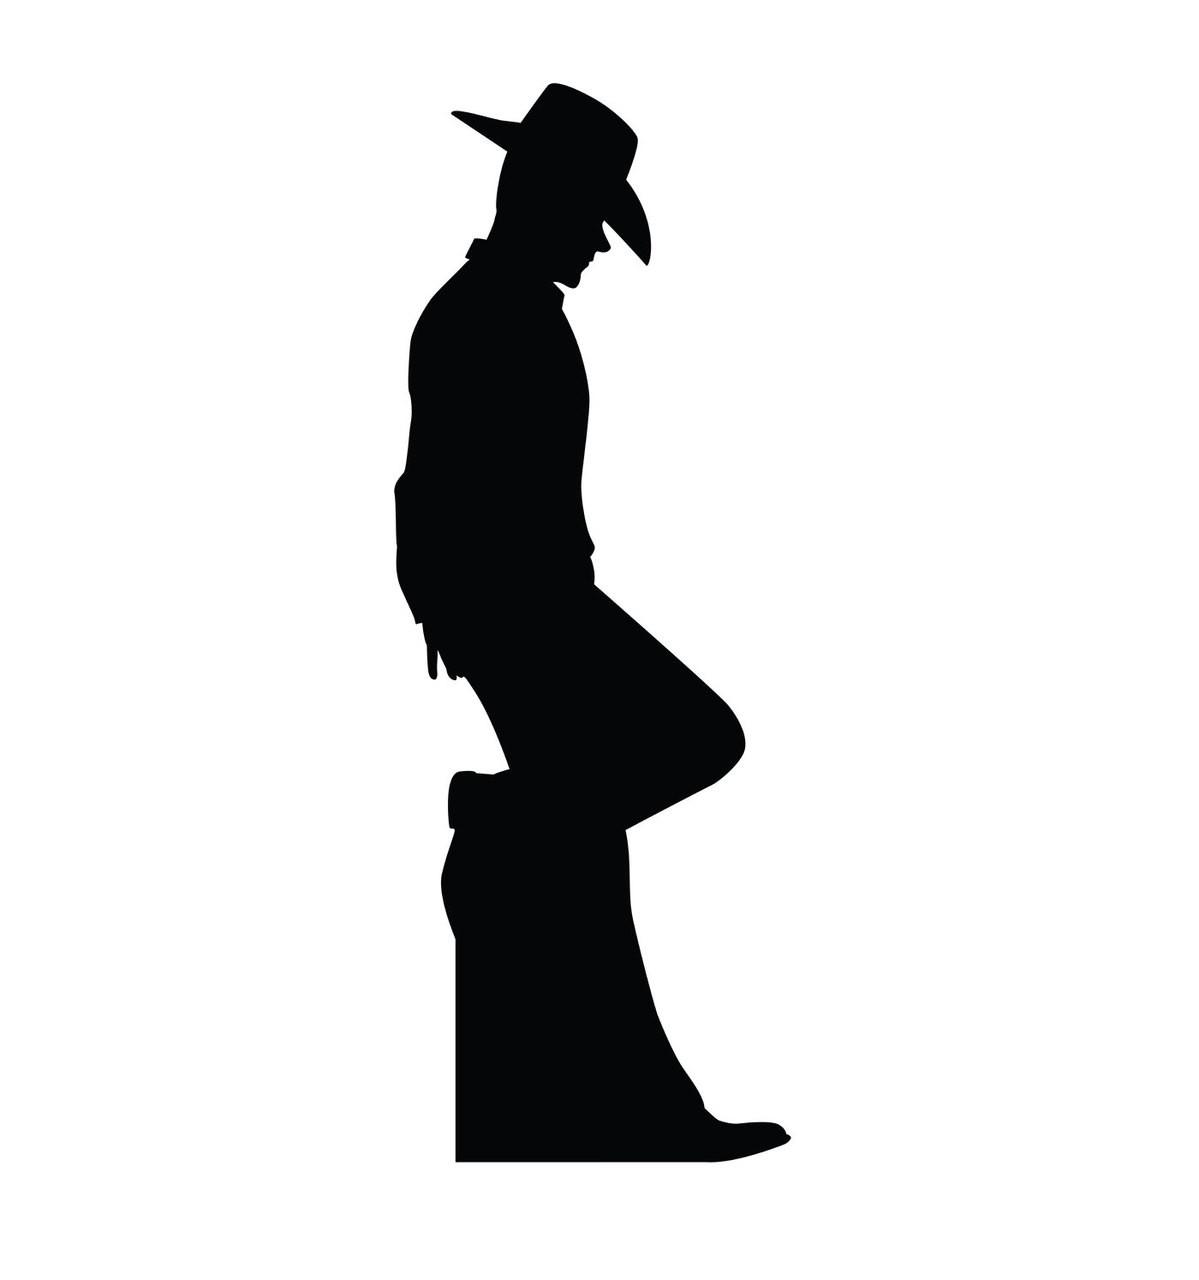 Cowboy Silhouette - Cardboard Cutout 2317